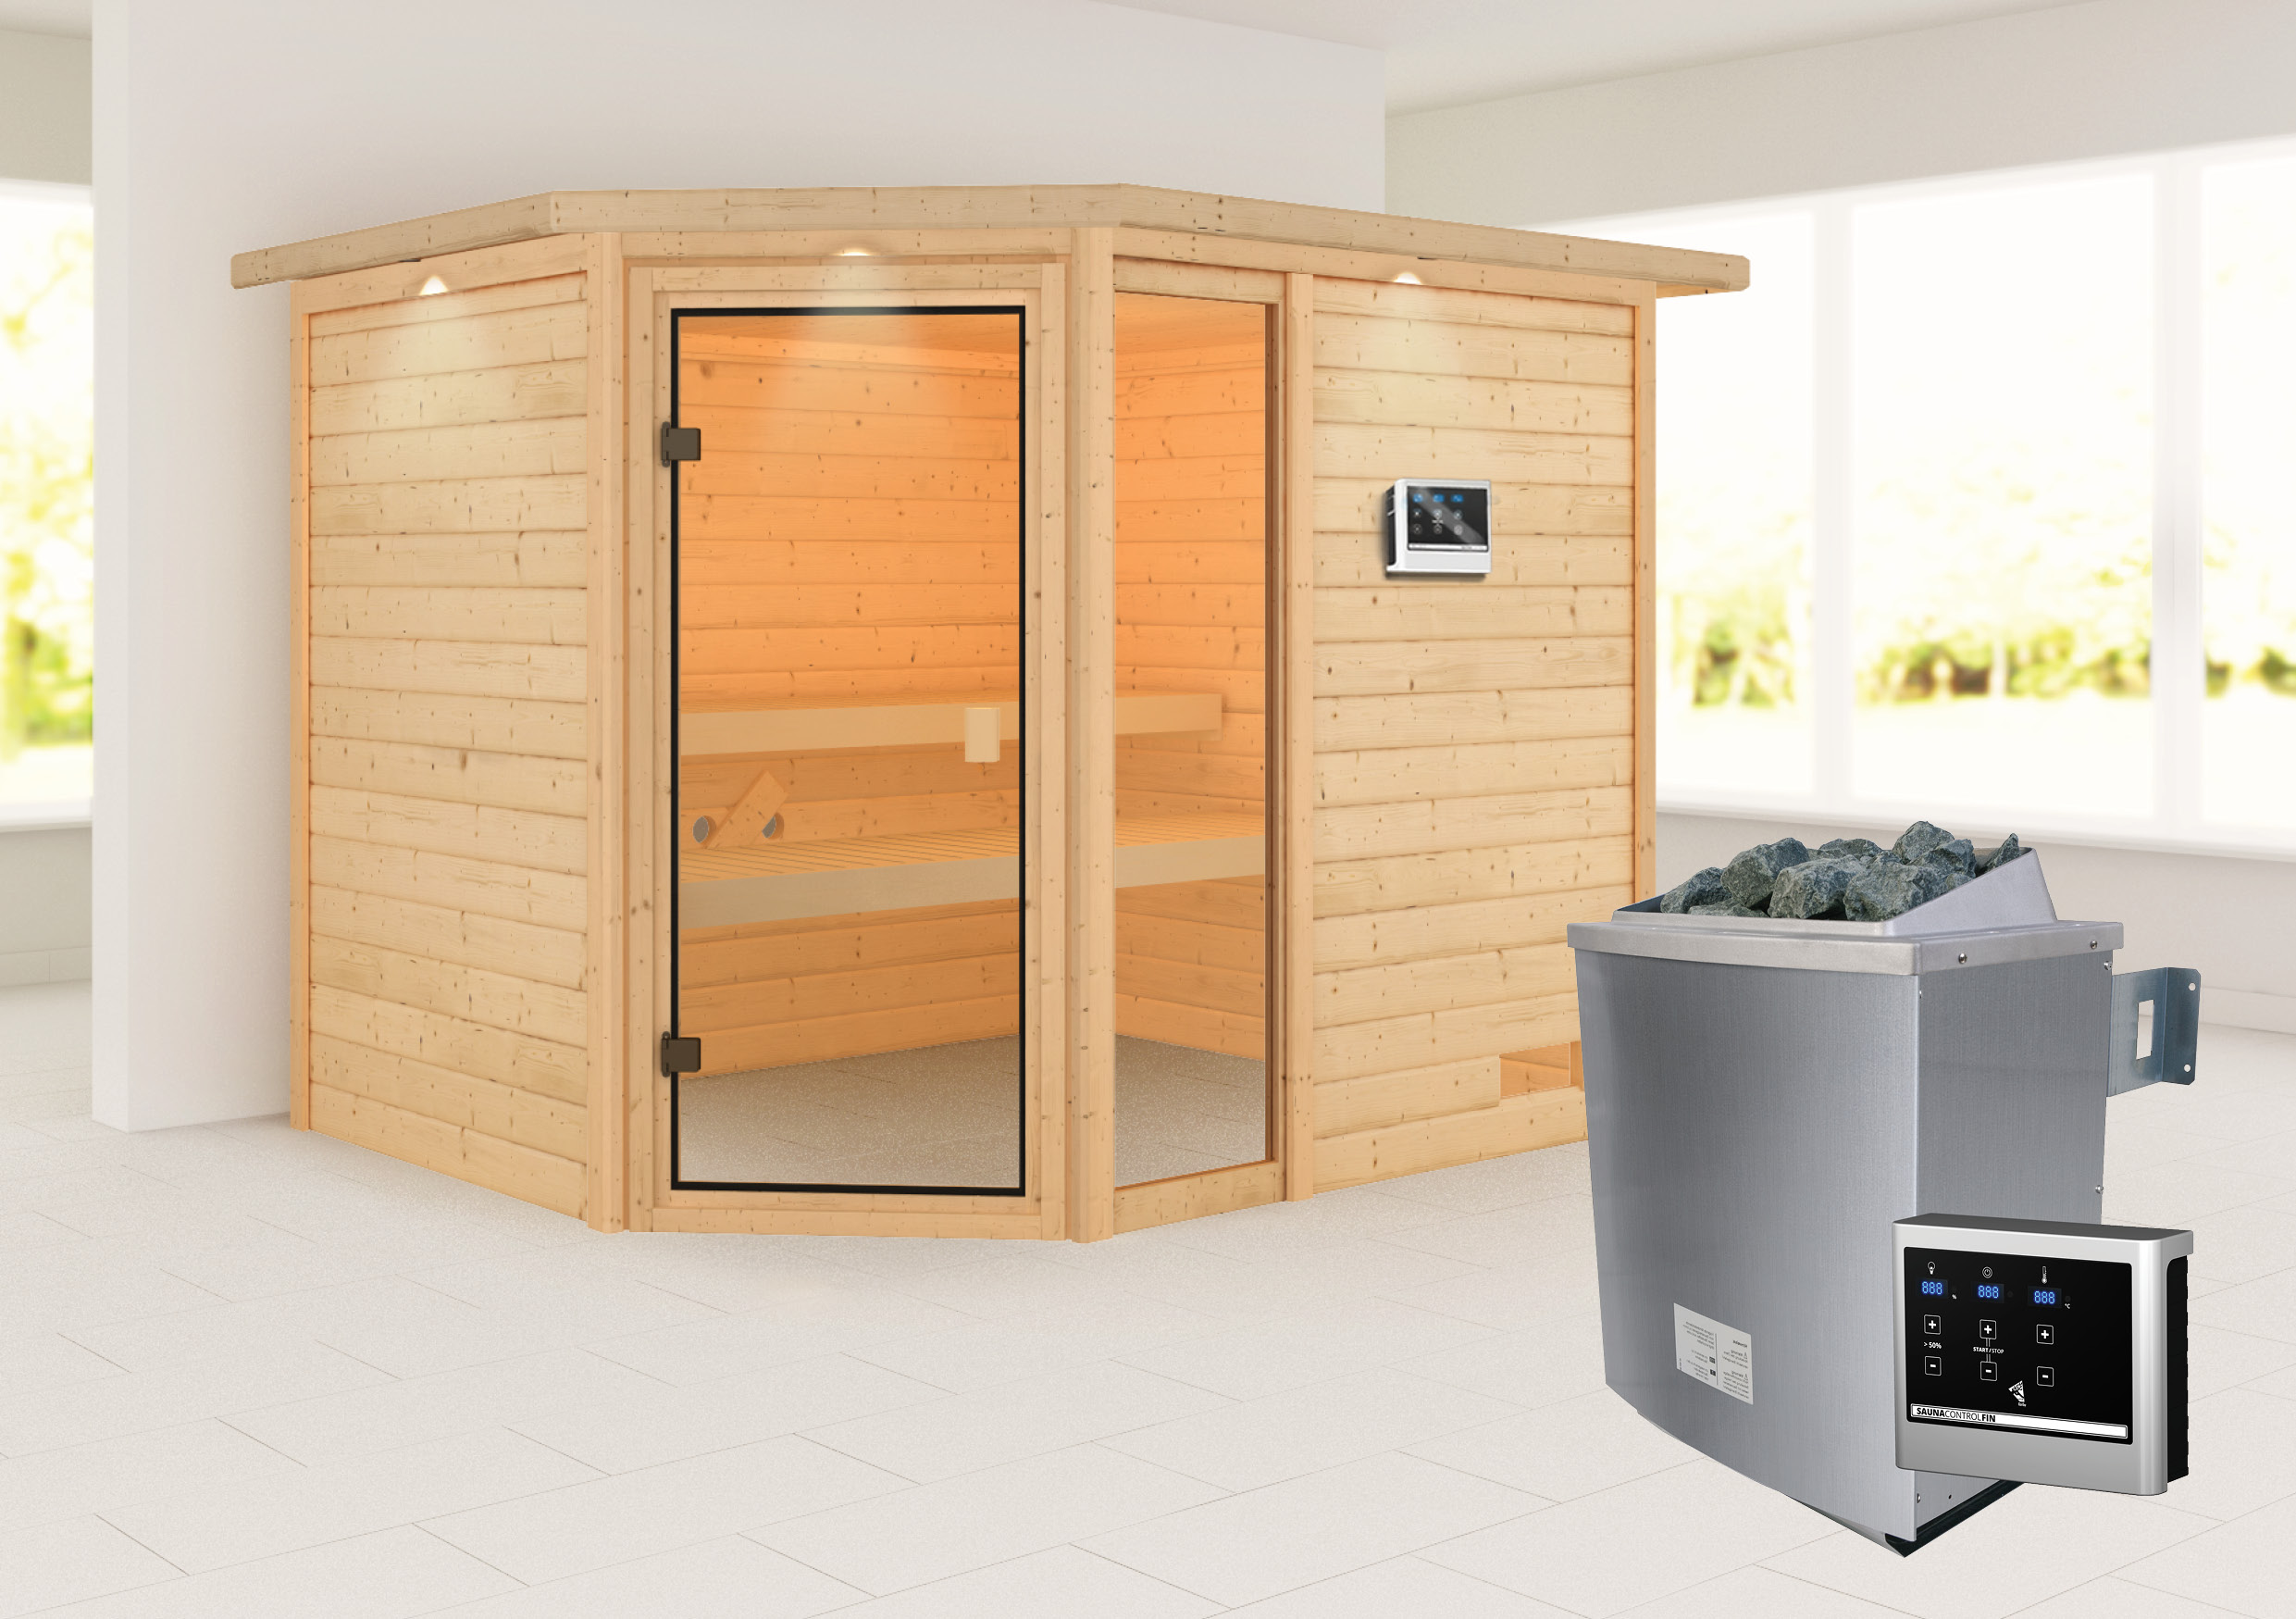 Woodfeeling Sauna Lola 38mm Dachkranz Saunaofen 9 kW extern Bild 1